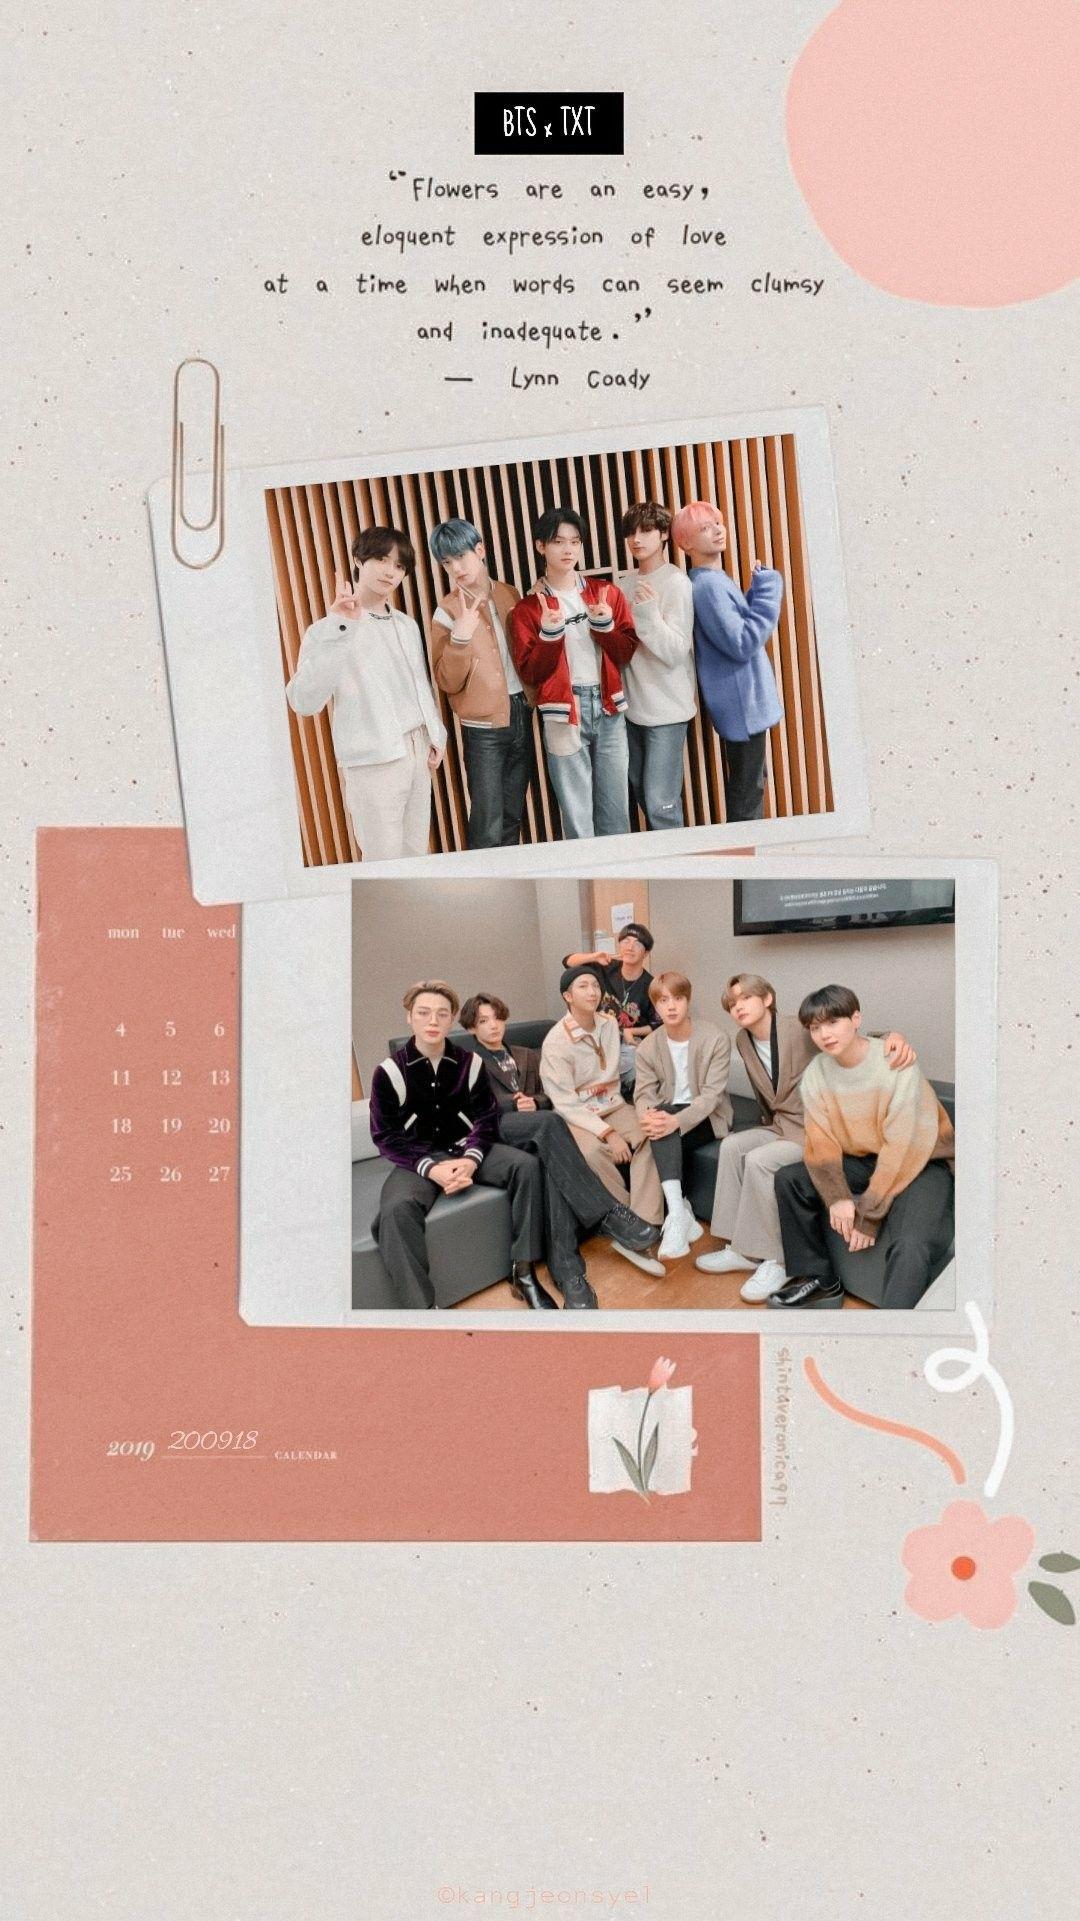 Txt X Bts Wallpapers Penyimpanan Foto Konser Gambar Bts and txt wallpaper aesthetic